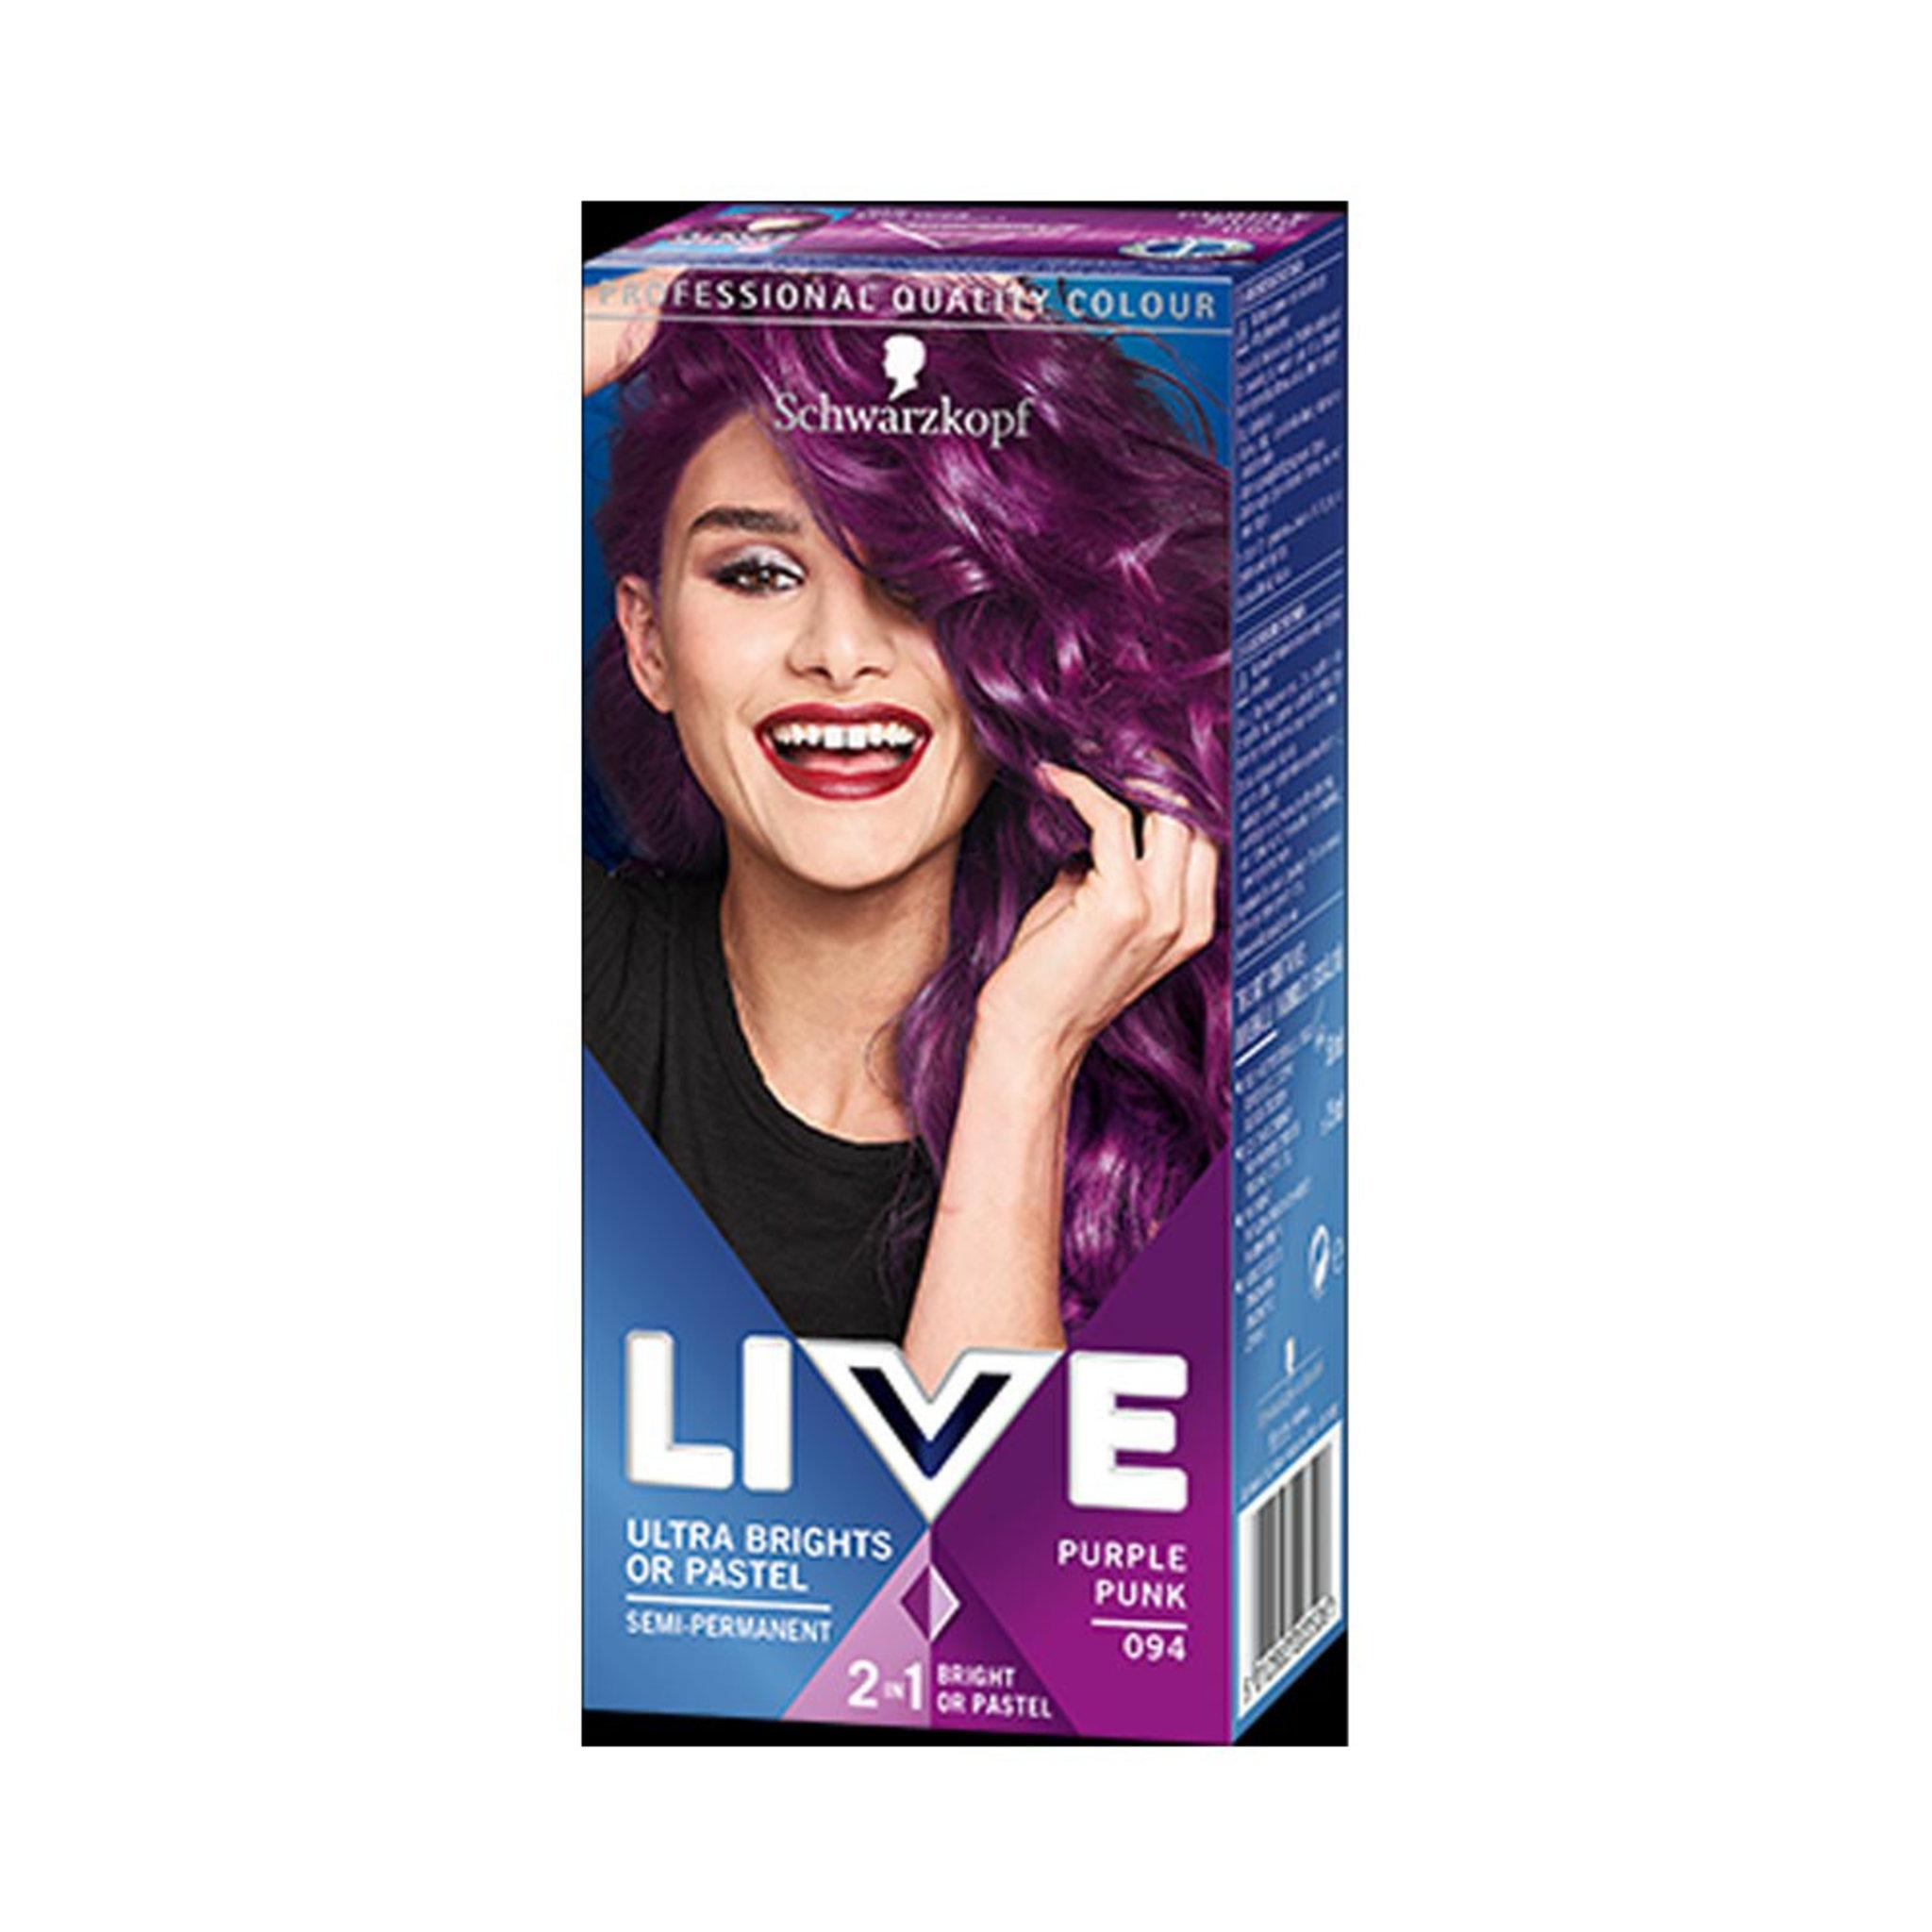 LIVE Ultra Brights - 094 Purple Punk